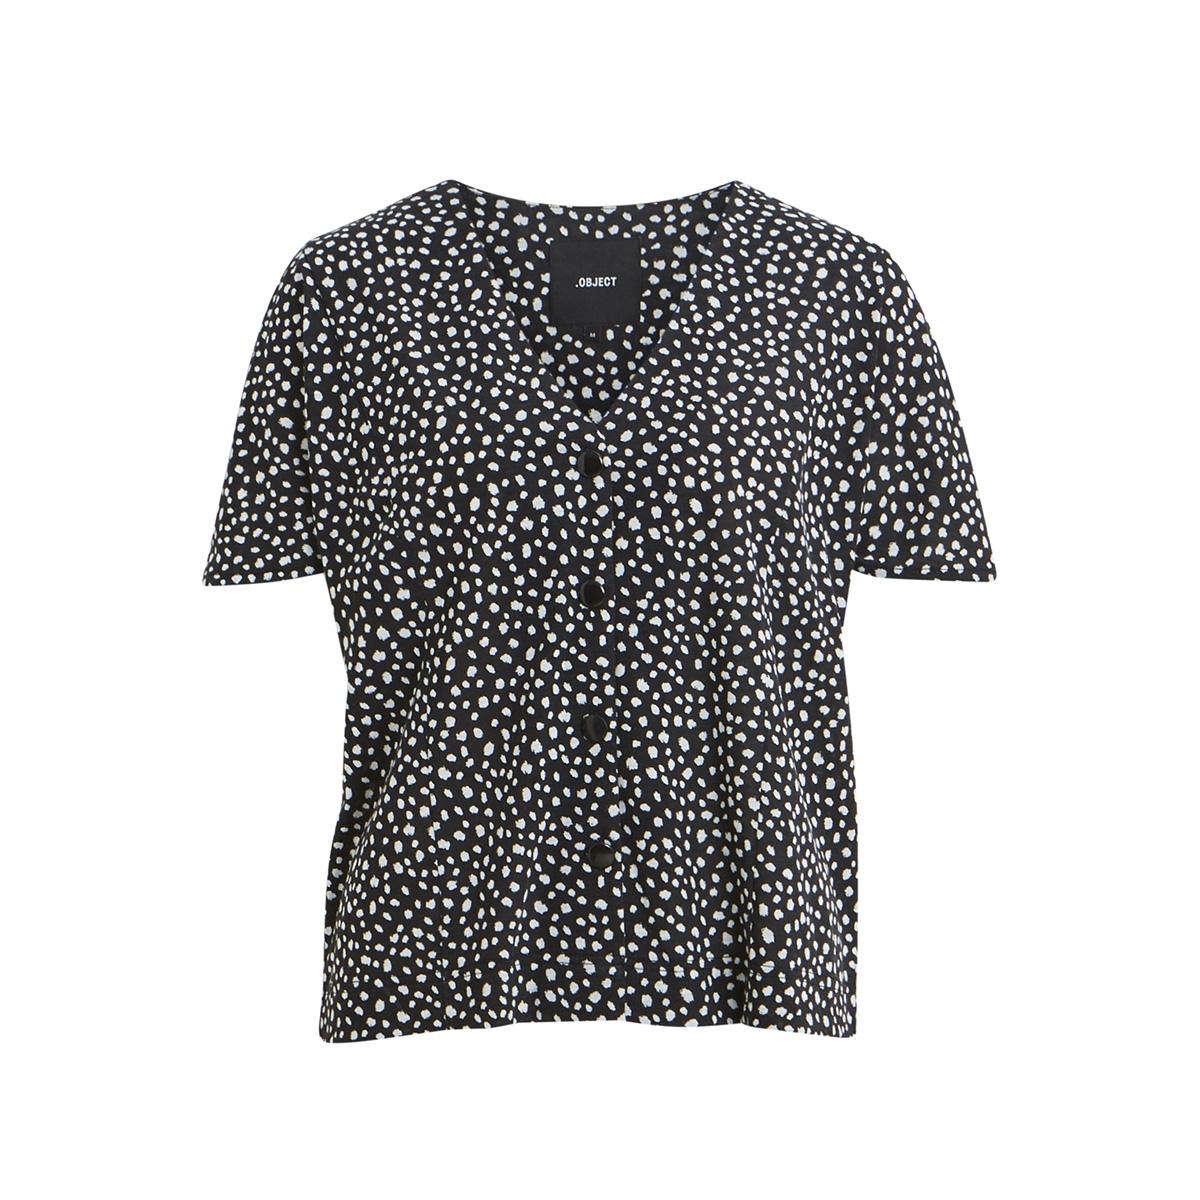 objsimona s/s top 103 23029531 object t-shirt black